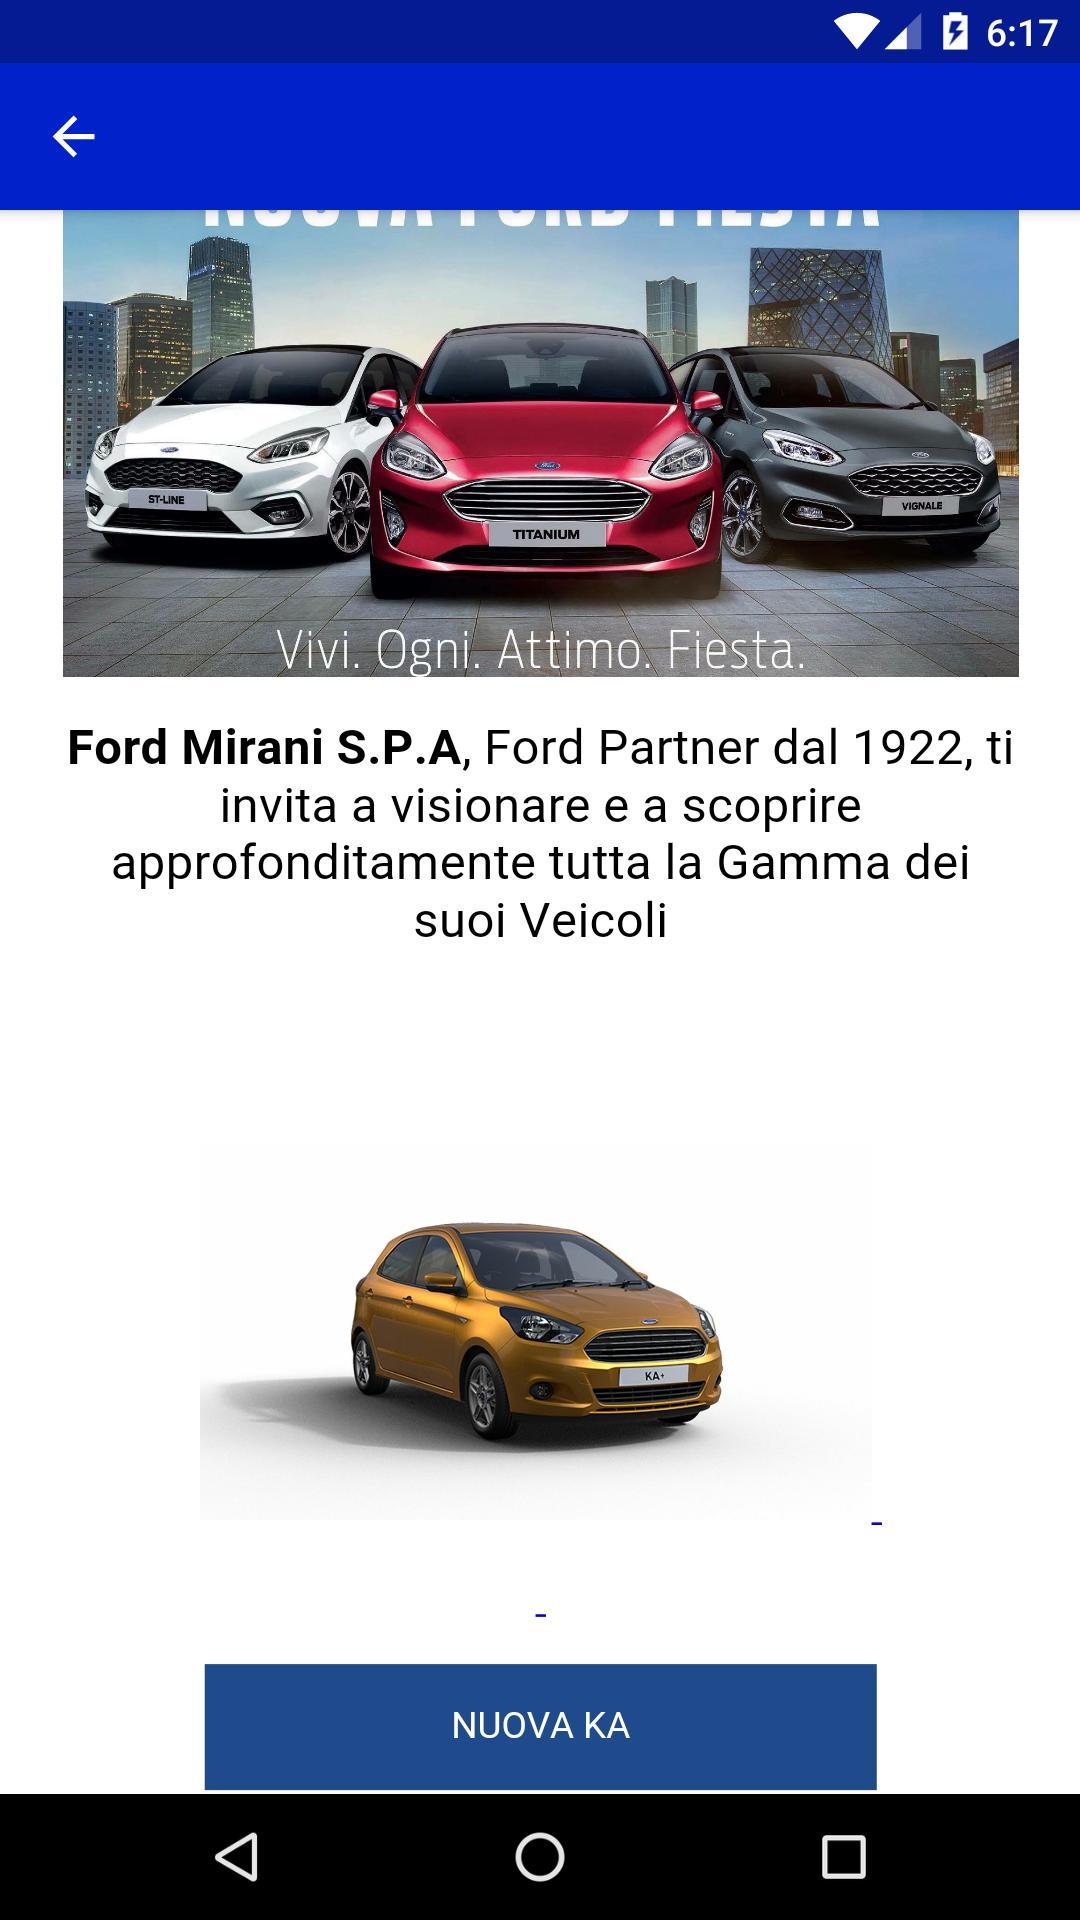 Ford Mirani poster